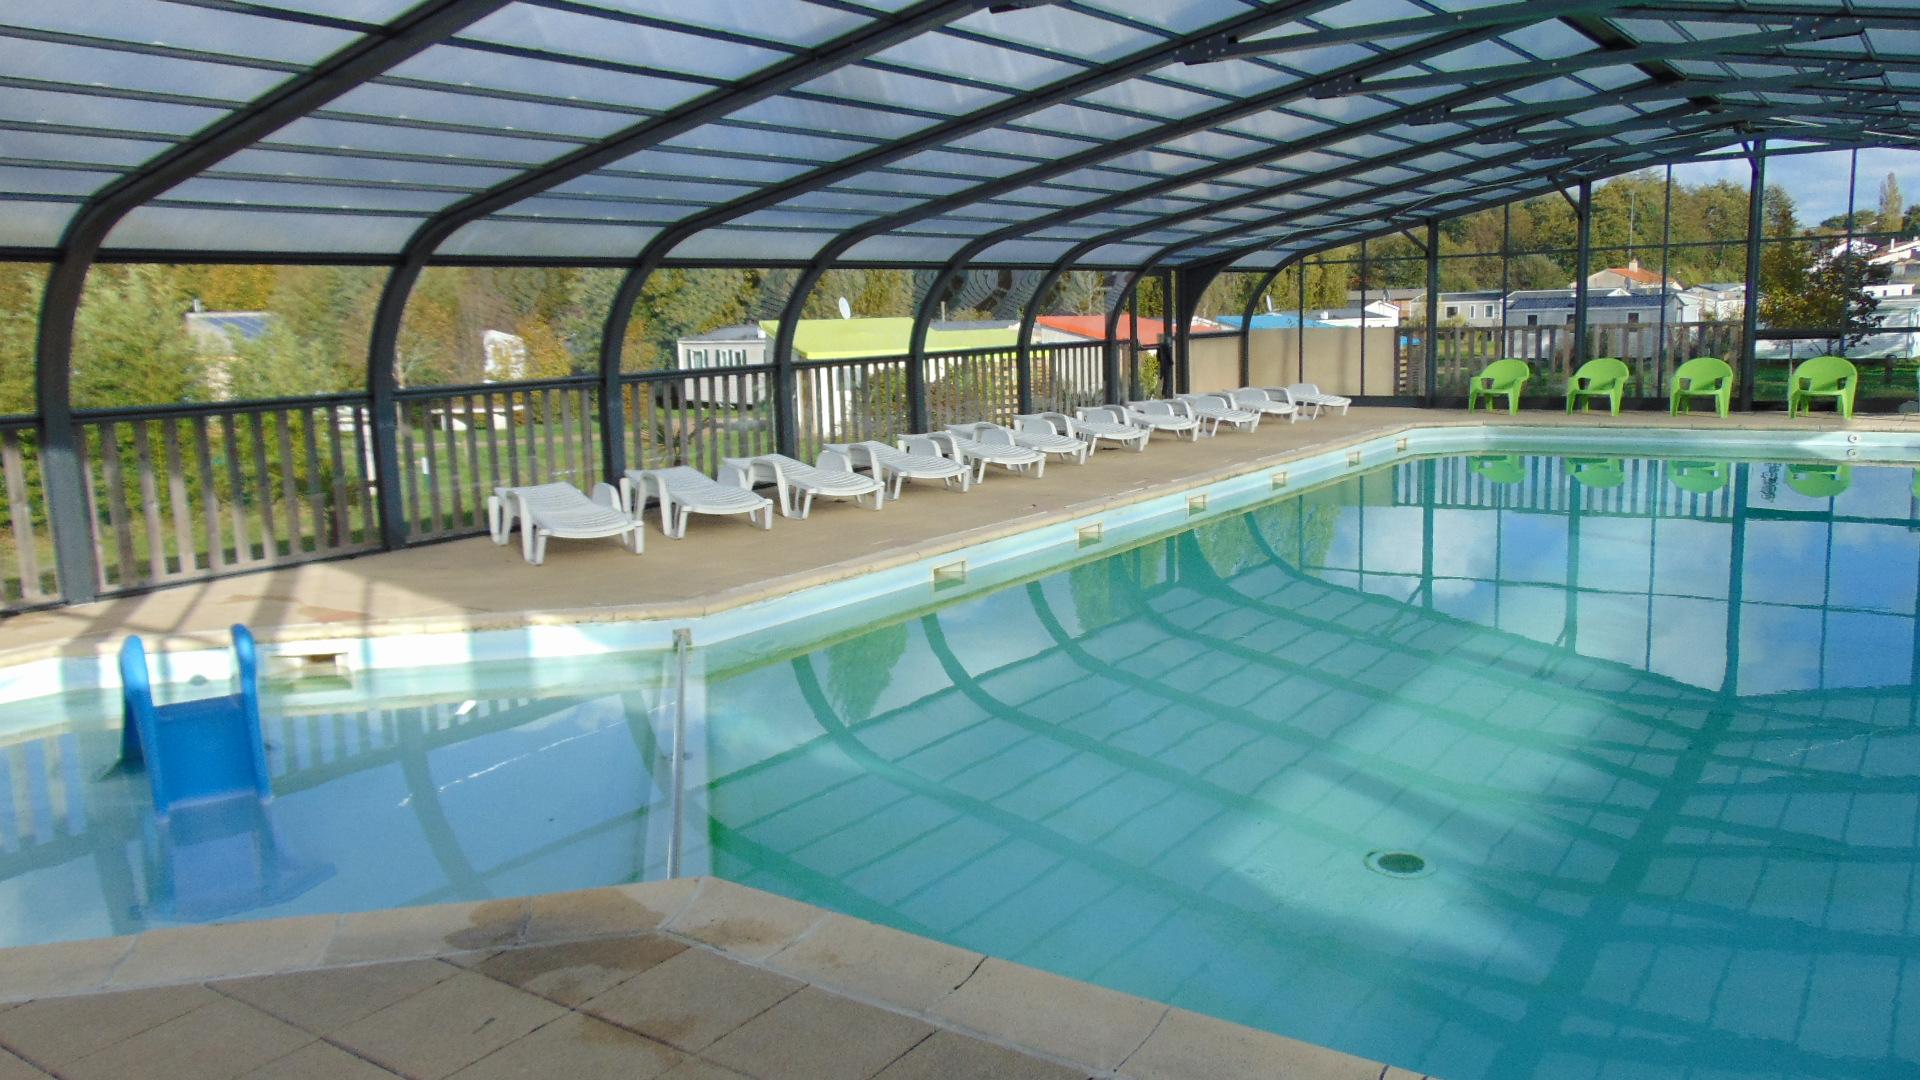 Camping vend e avec piscine couverte for Camping limoges avec piscine